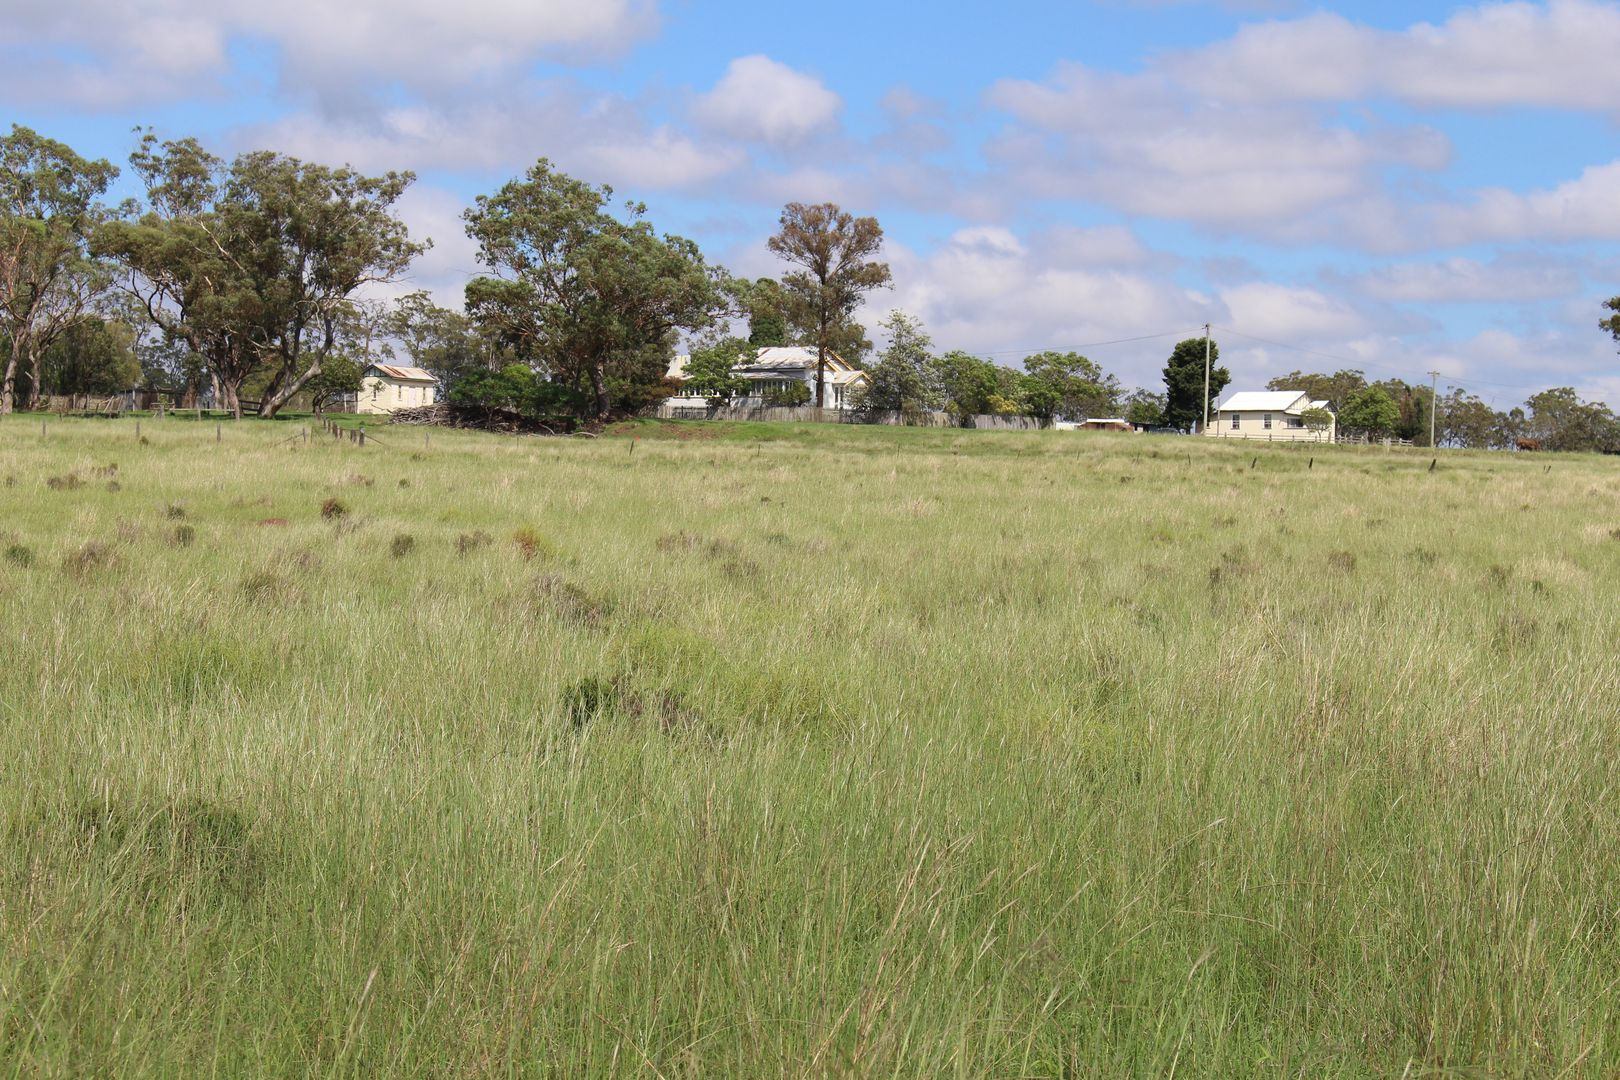 0 Kingsthorpe-Haden Rd, Goombungee QLD 4354, Image 0